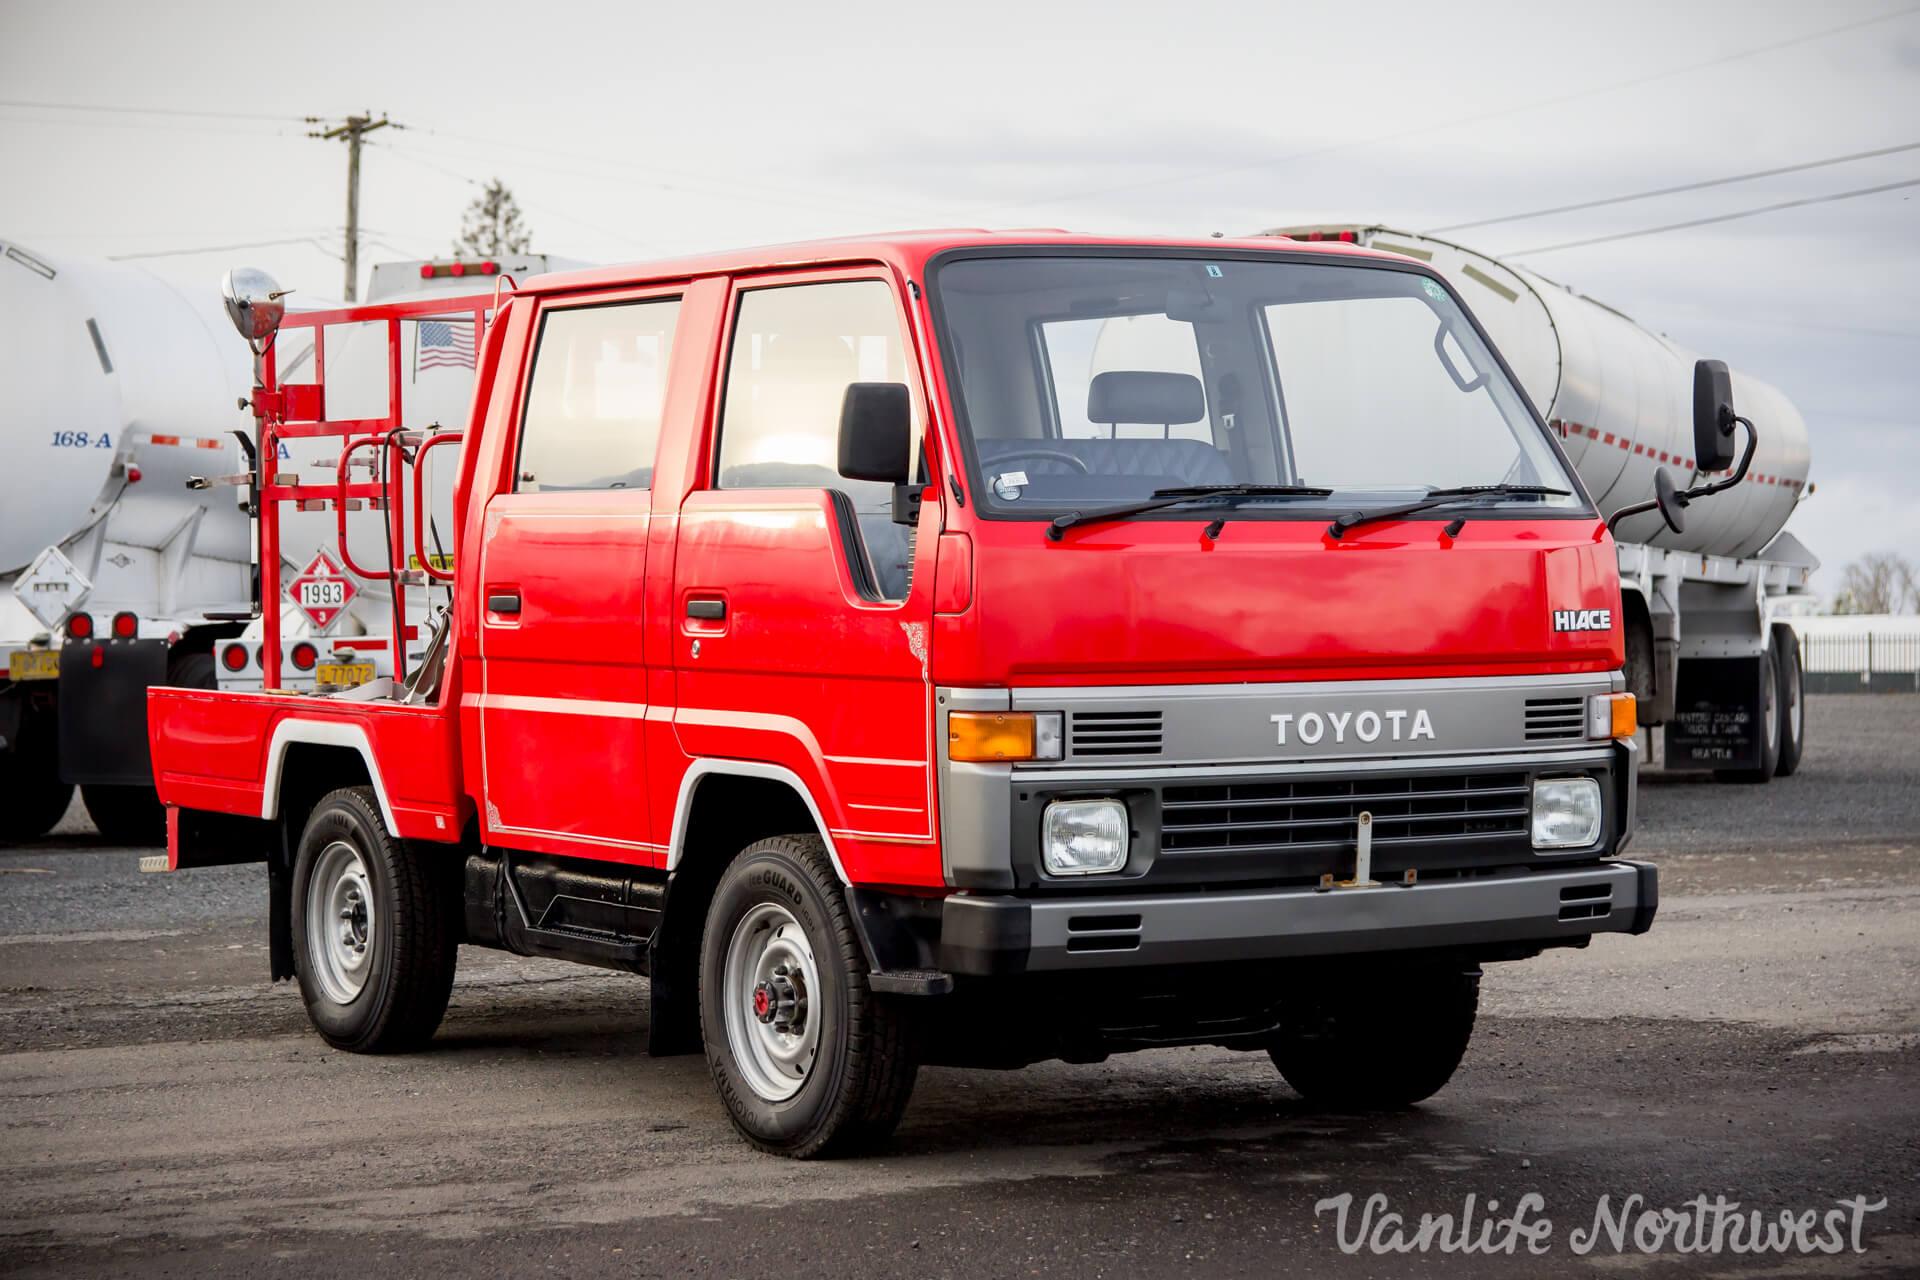 ToyotaHiaceFireTruckLH851990-6.jpg